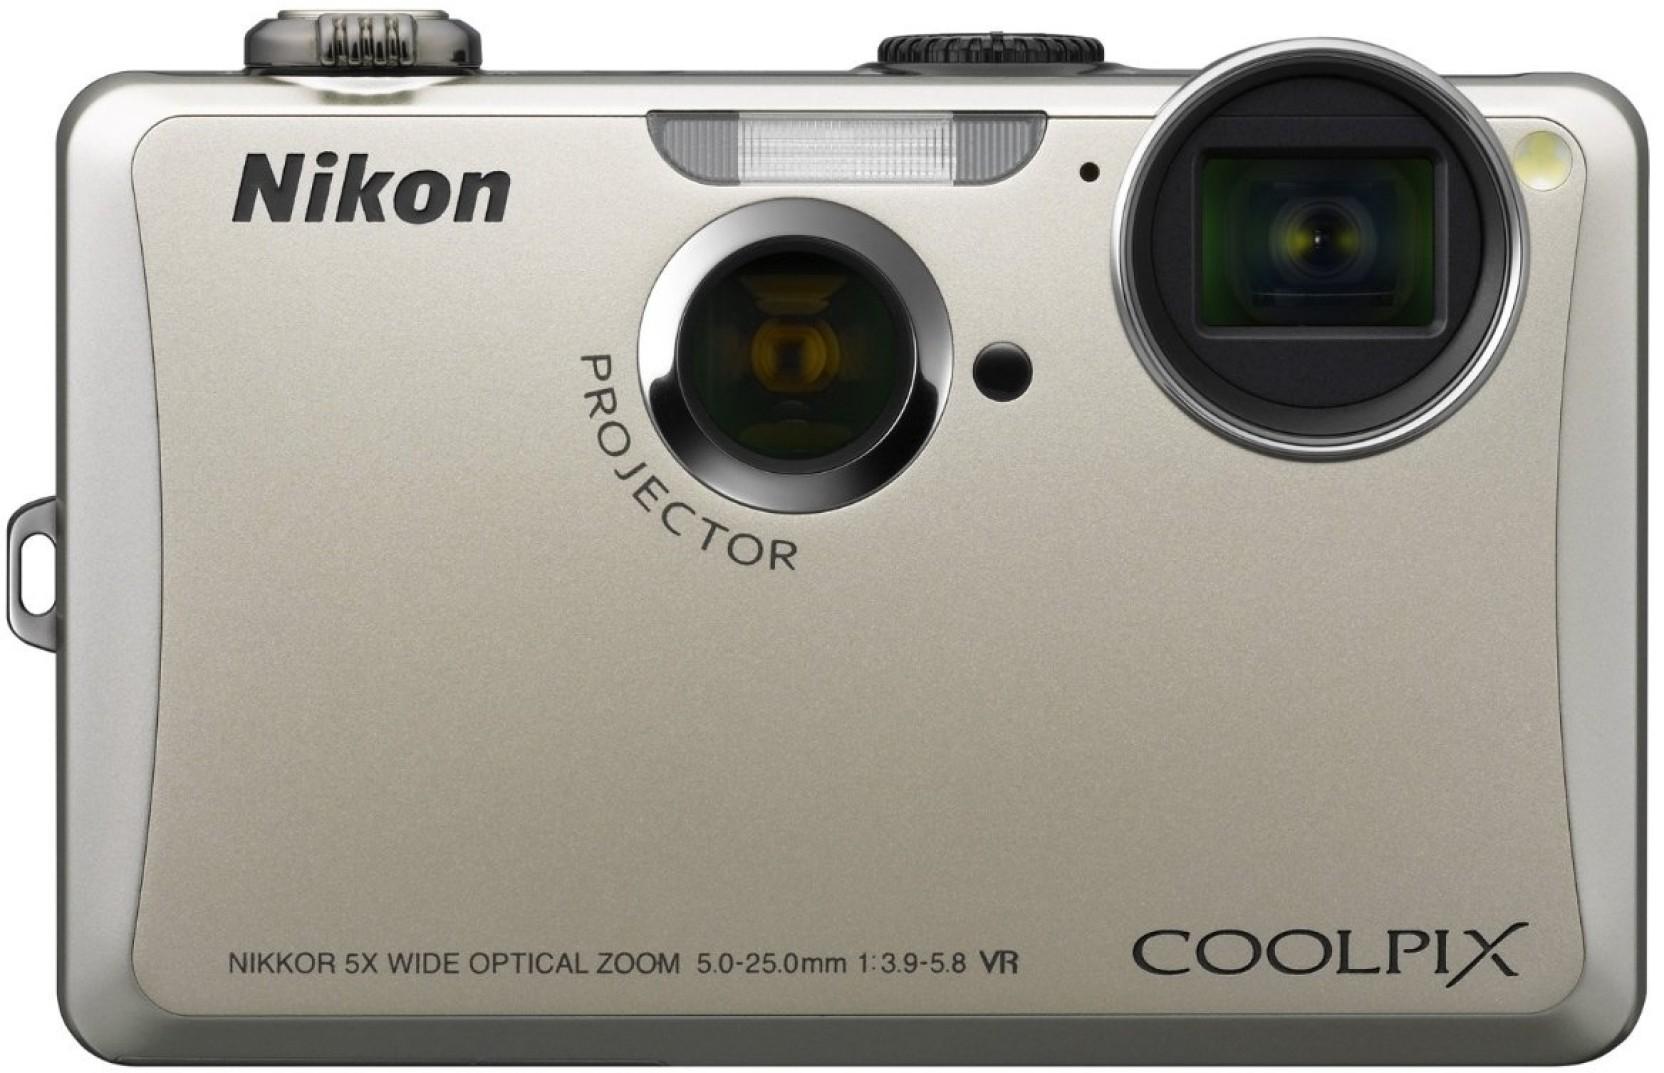 Buy Nikon Coolpix S1100pj Point Shoot Camera Online S3600 201mp Digital Silver Ebay Home